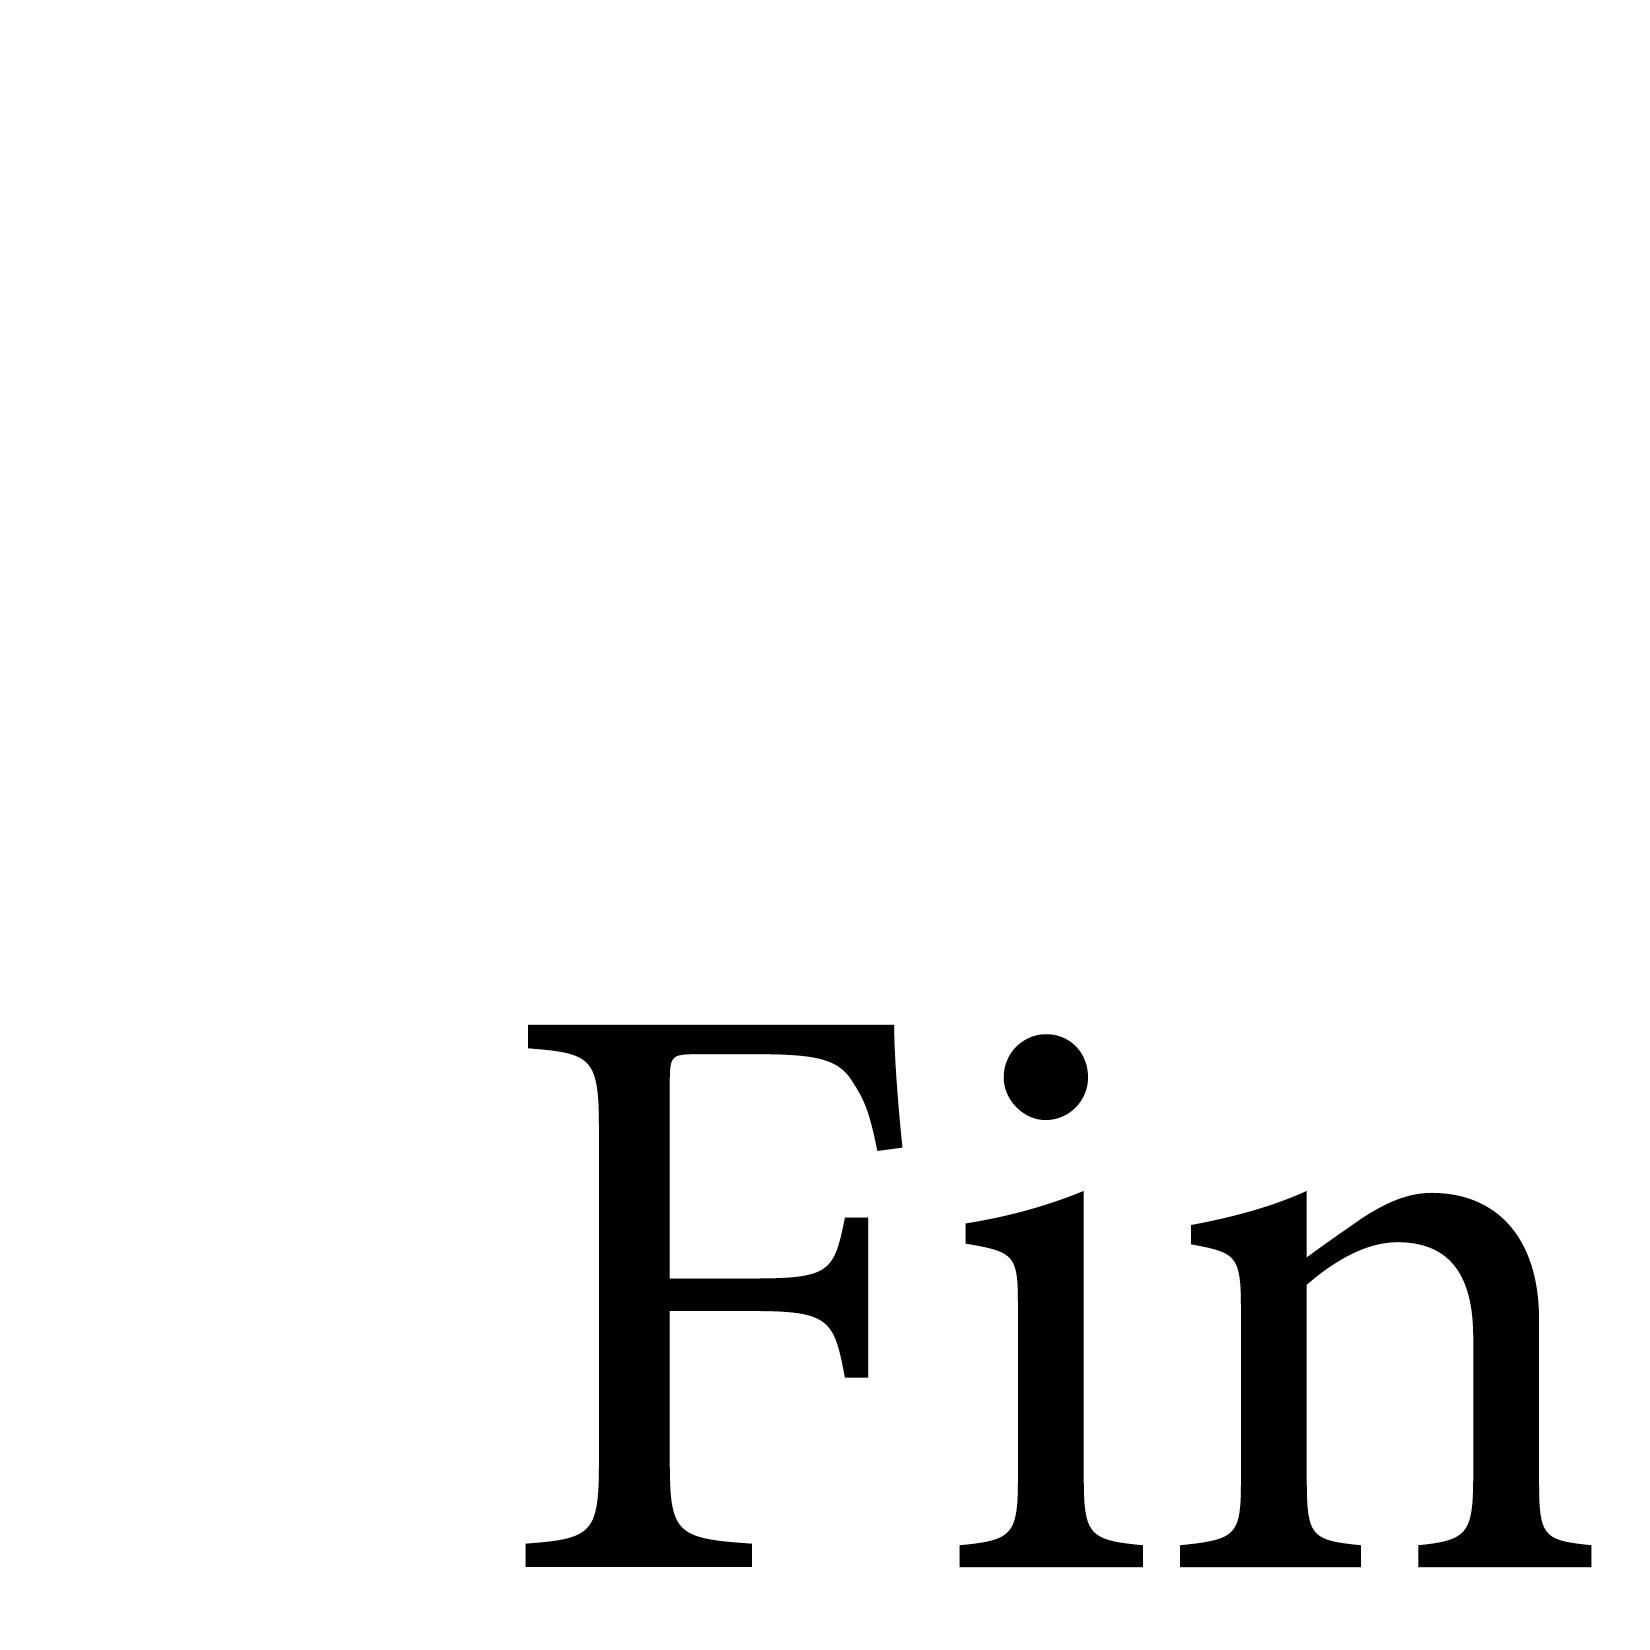 Robertson Final Typebook9